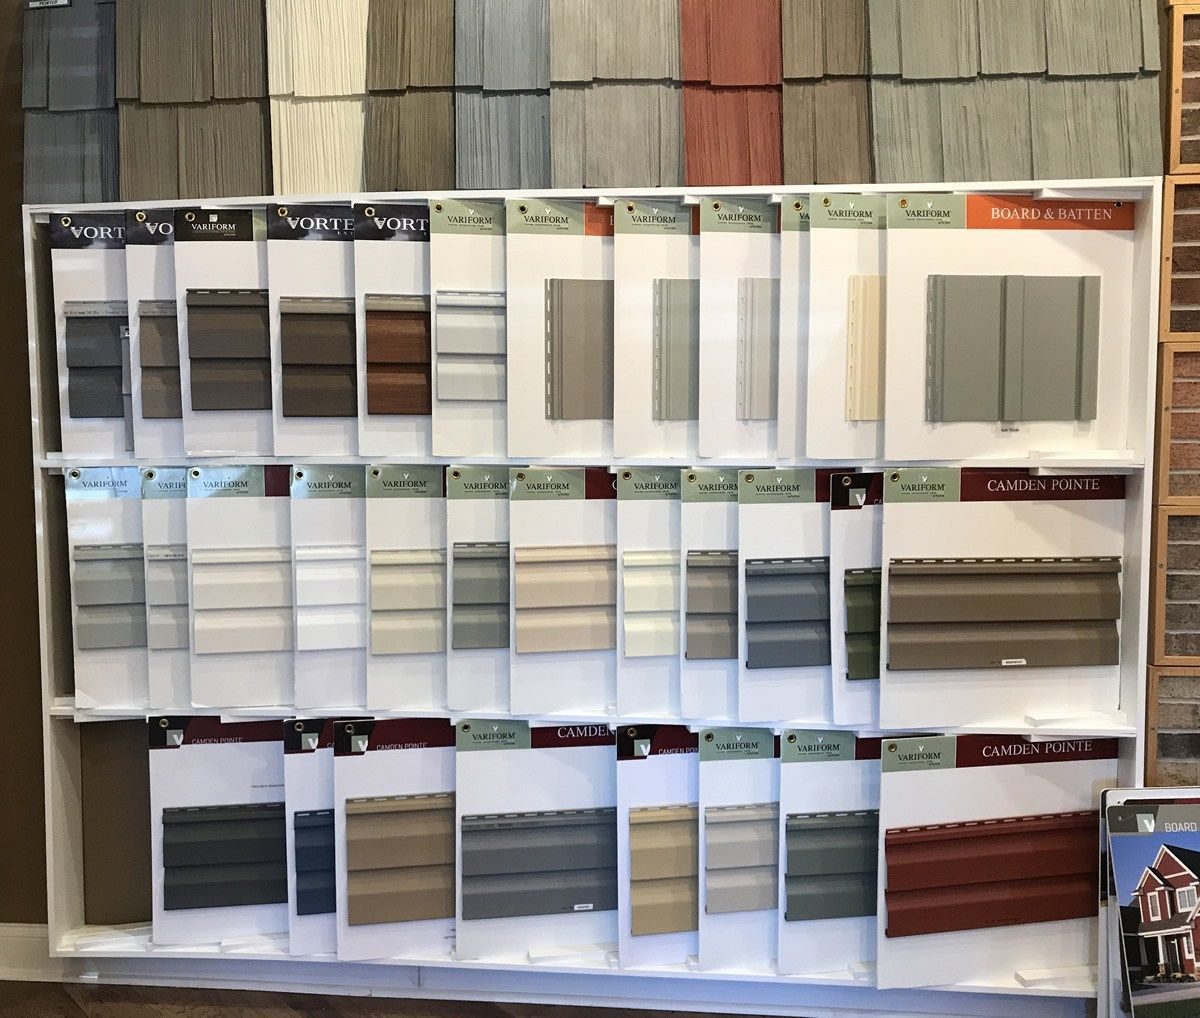 Vinyl Siding Options At The Schumacher Homes Design Center